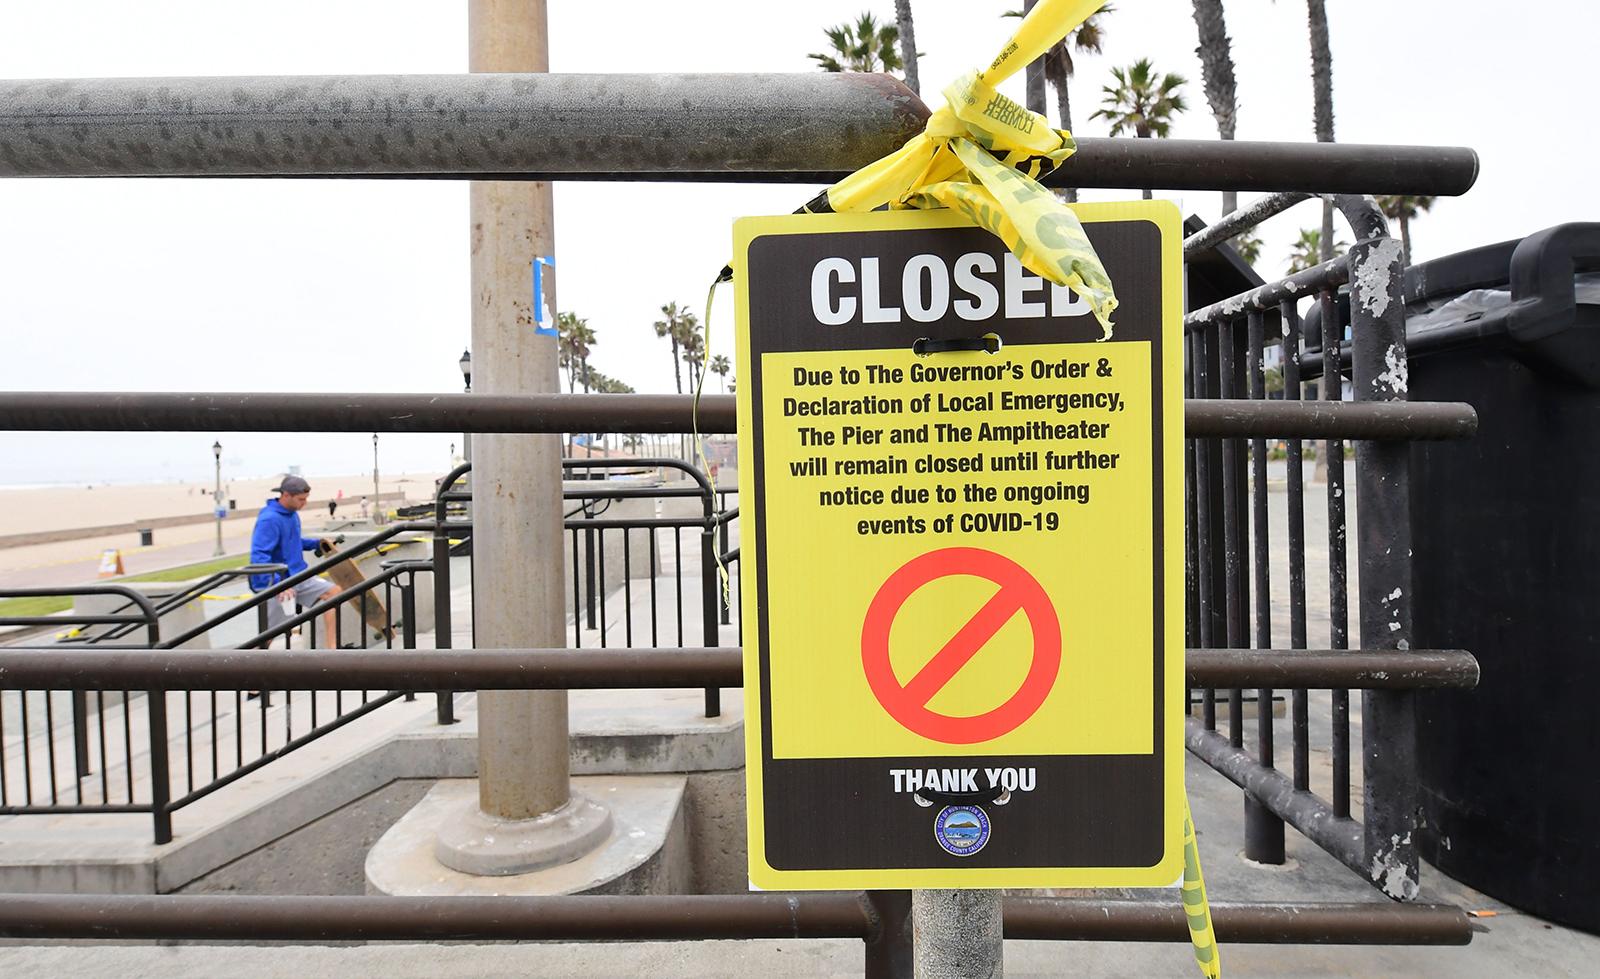 A sign announcing beach closures is seen at Huntington Beach, California, on Thursday, April 30.